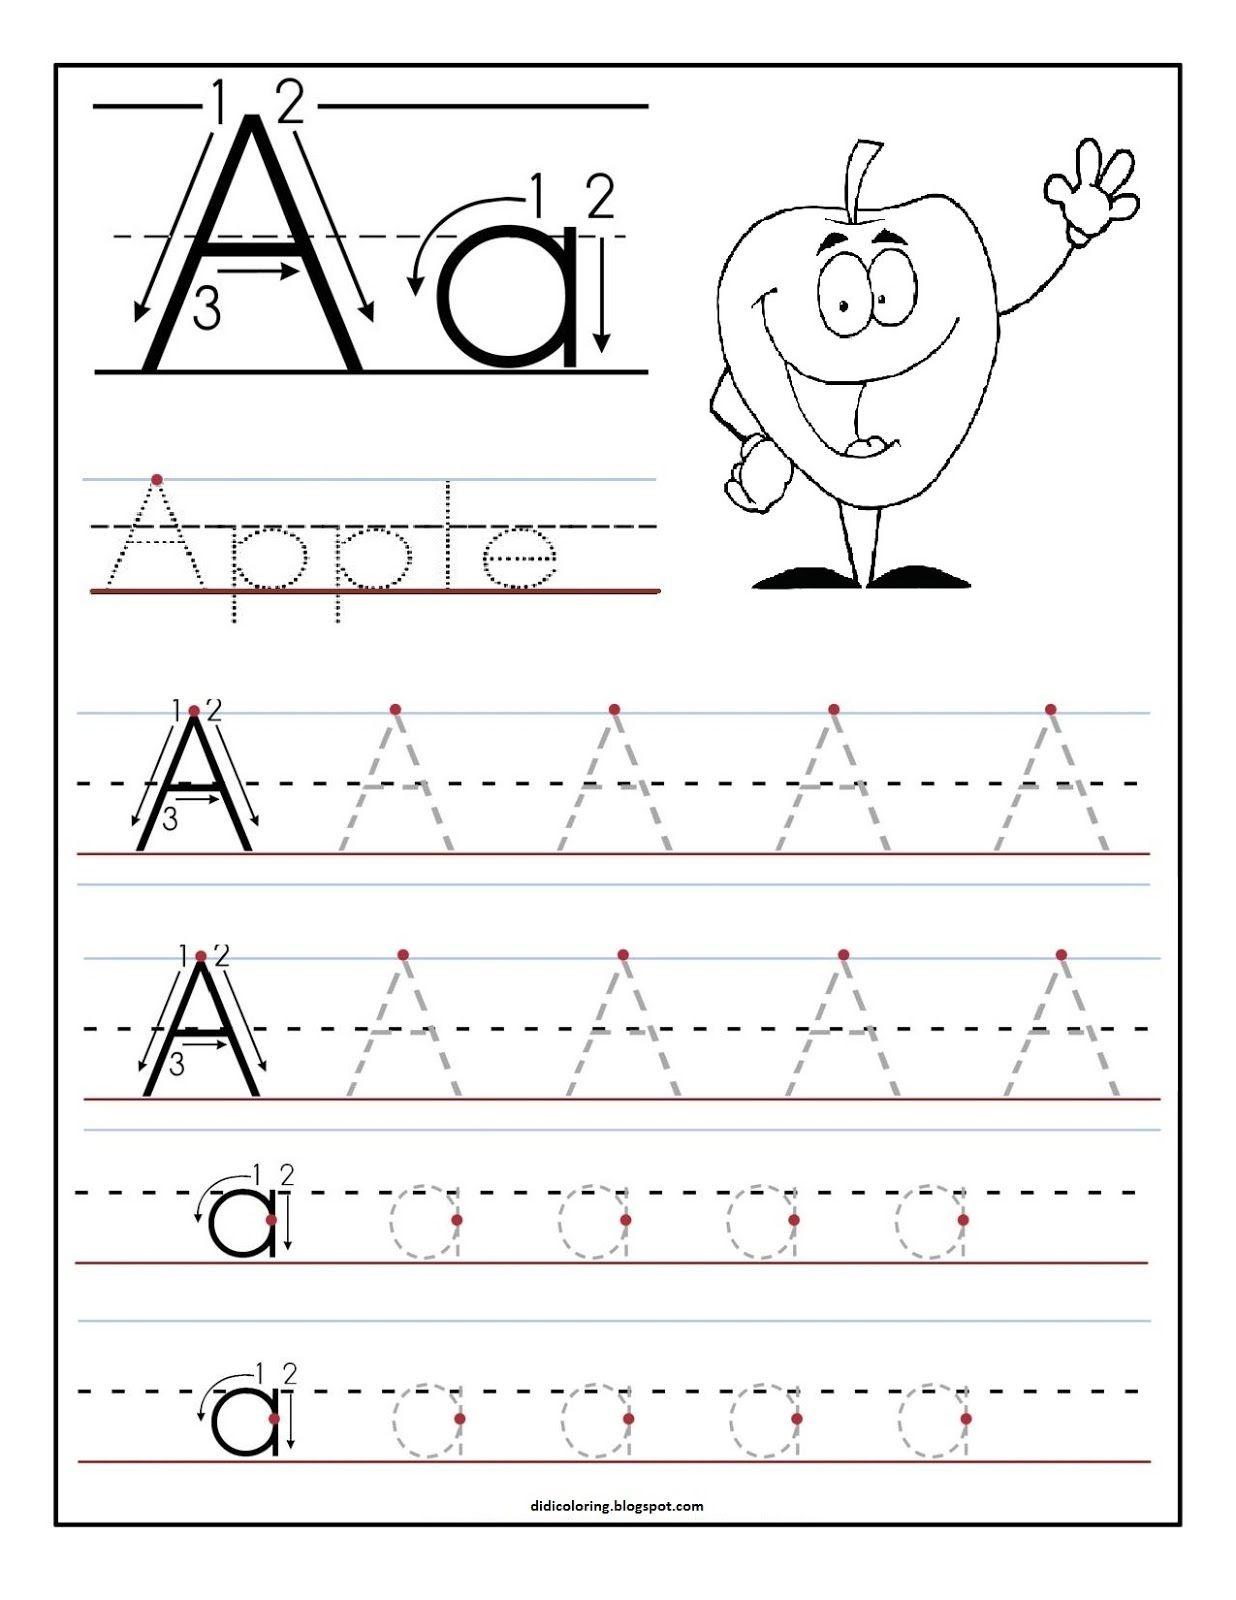 Free Printable Worksheet Letter A For Your Child To Learn And Write - Free Printable Letter Writing Worksheets